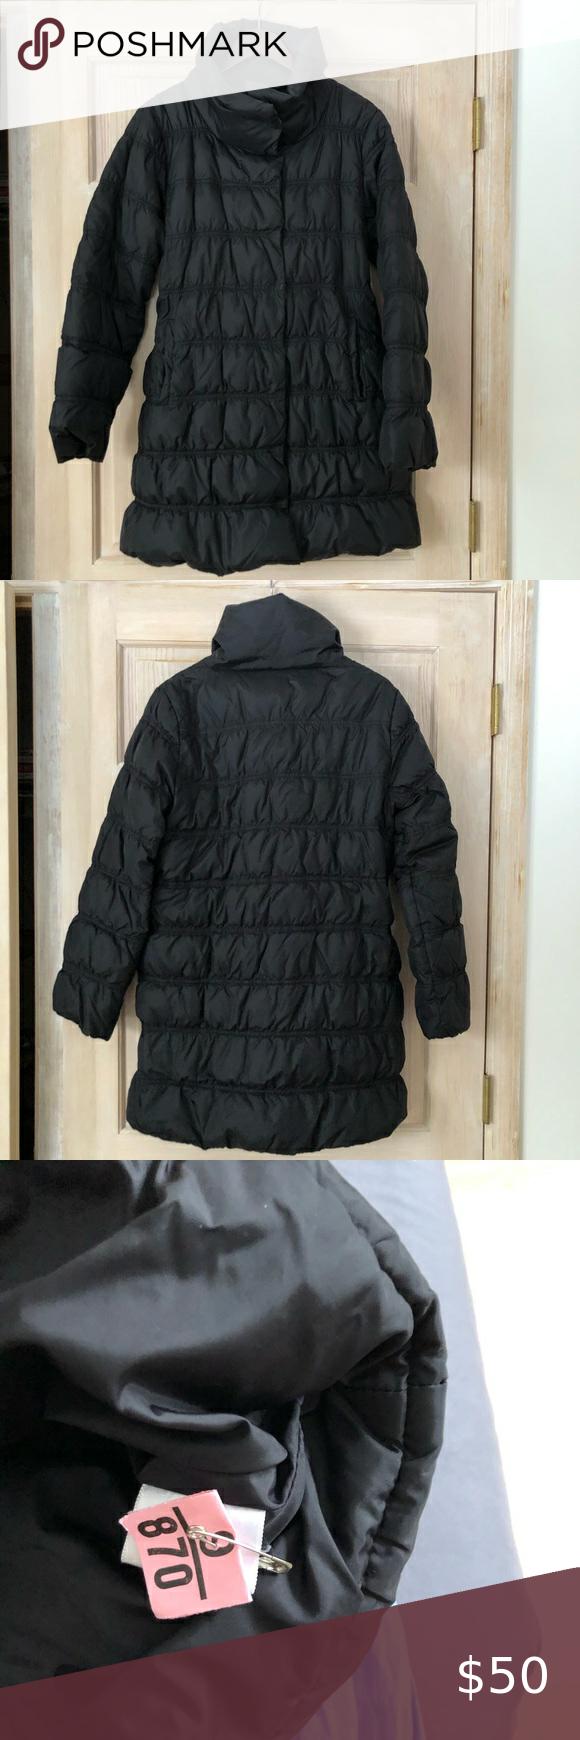 Eileen Fisher Black Down Jacket Size Small Long Parka Jacket Clothes Design Eileen Fisher Jacket [ 1740 x 580 Pixel ]